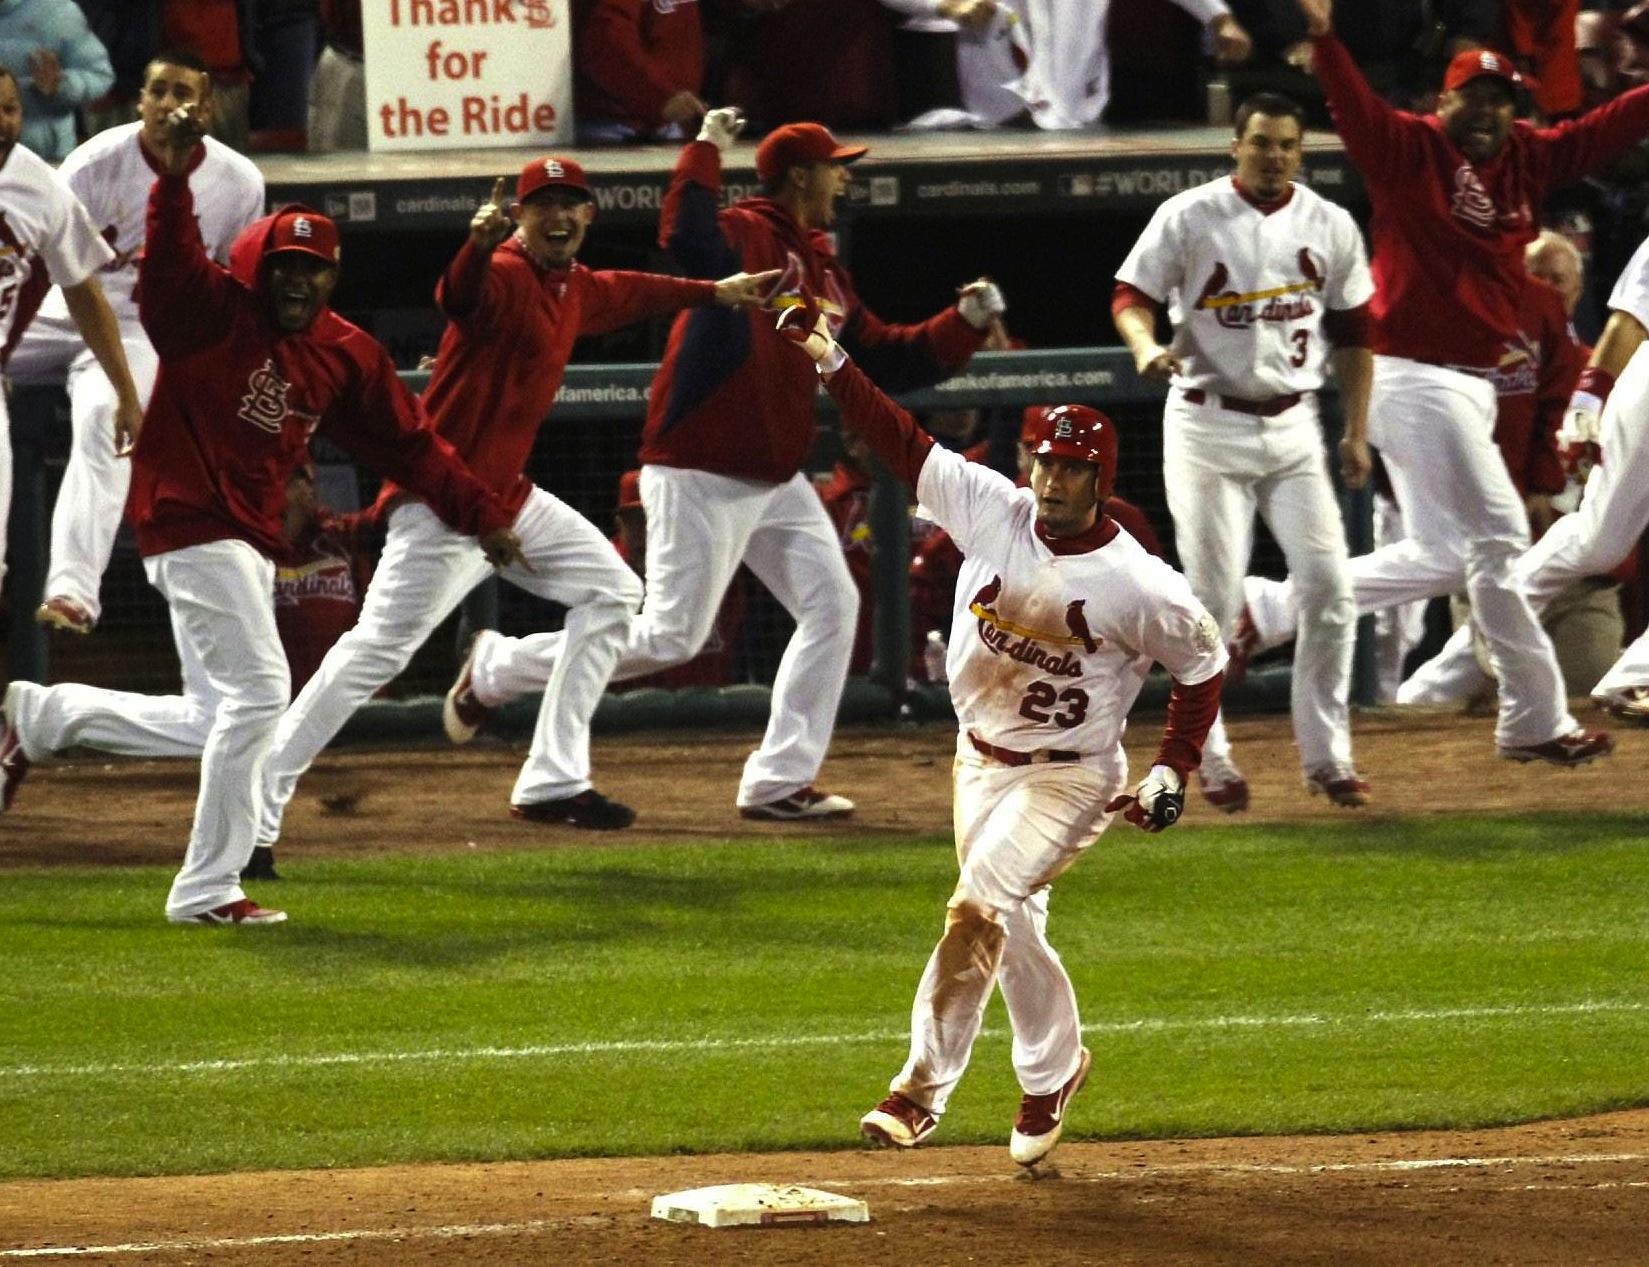 14 david freese home run game 6 hometown sports heroes